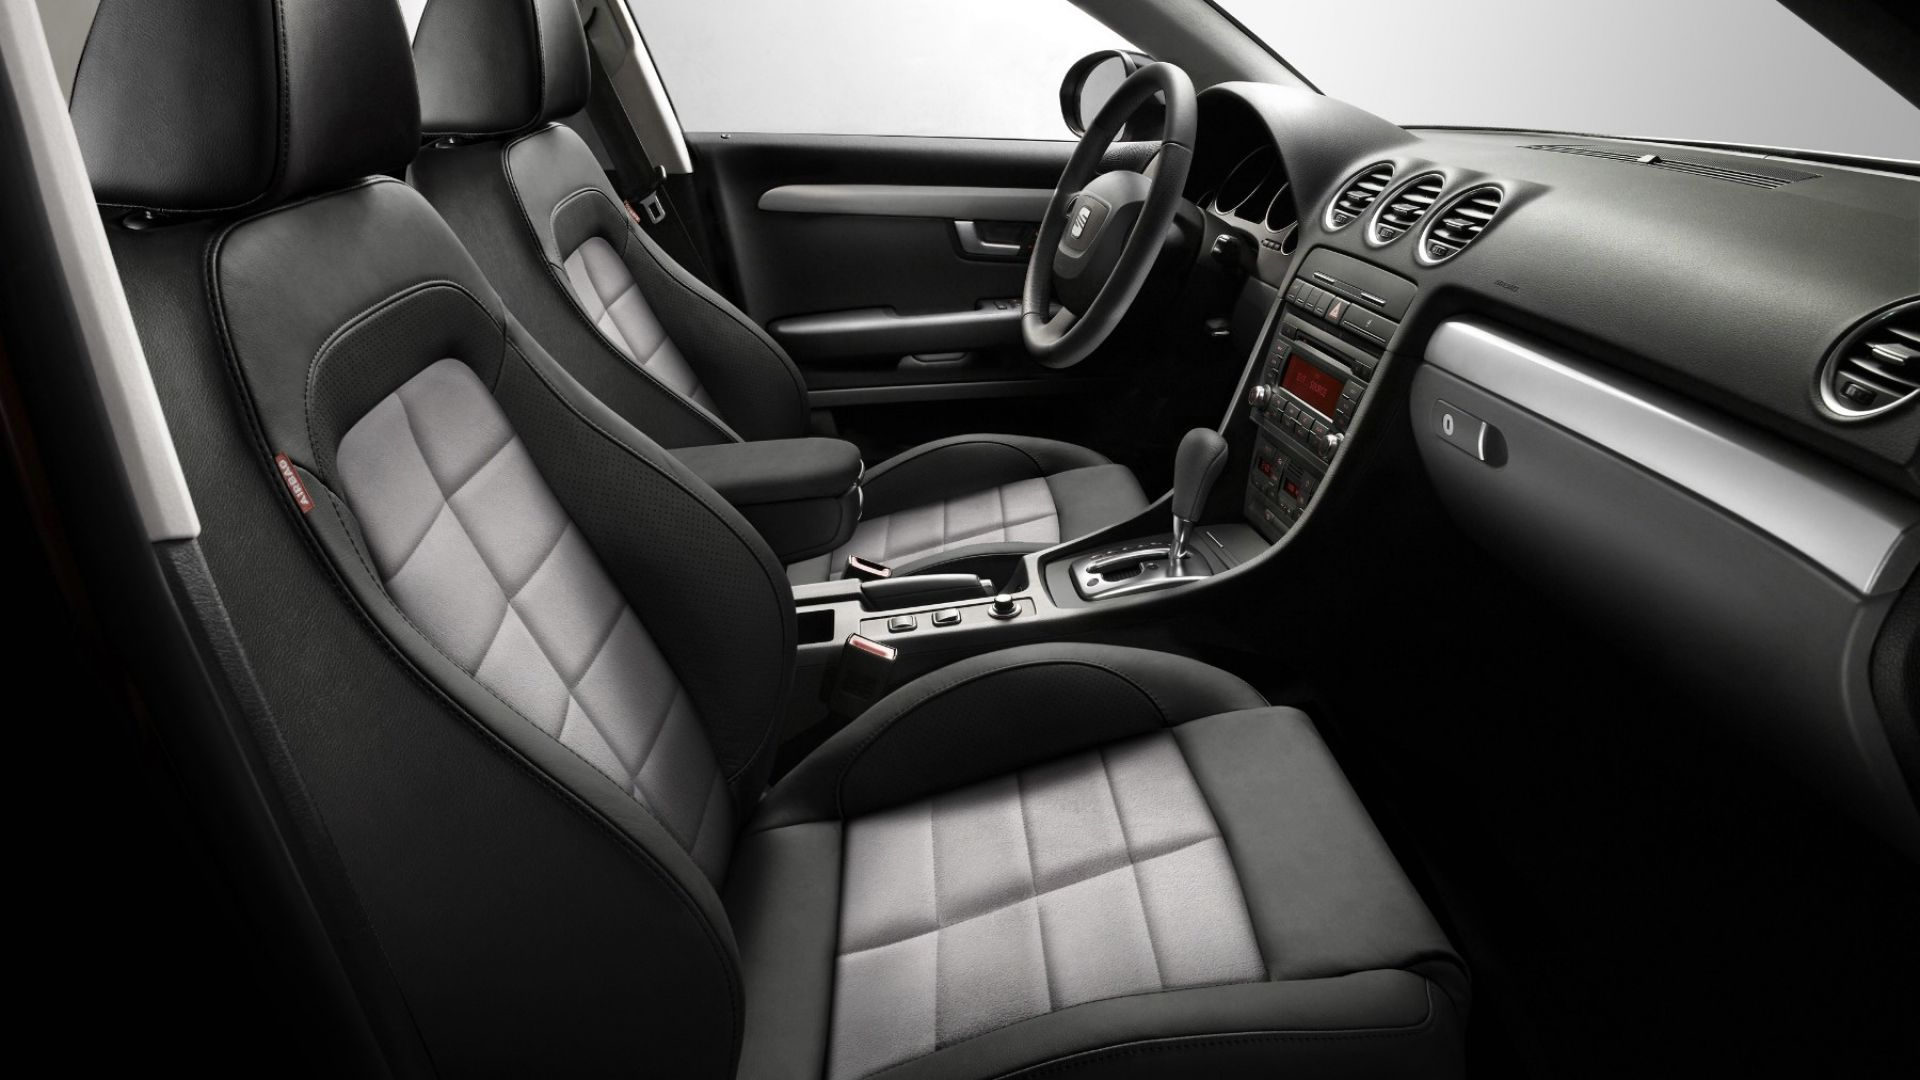 prossimamente seat exeo ed exeo st 2012 motorbox. Black Bedroom Furniture Sets. Home Design Ideas